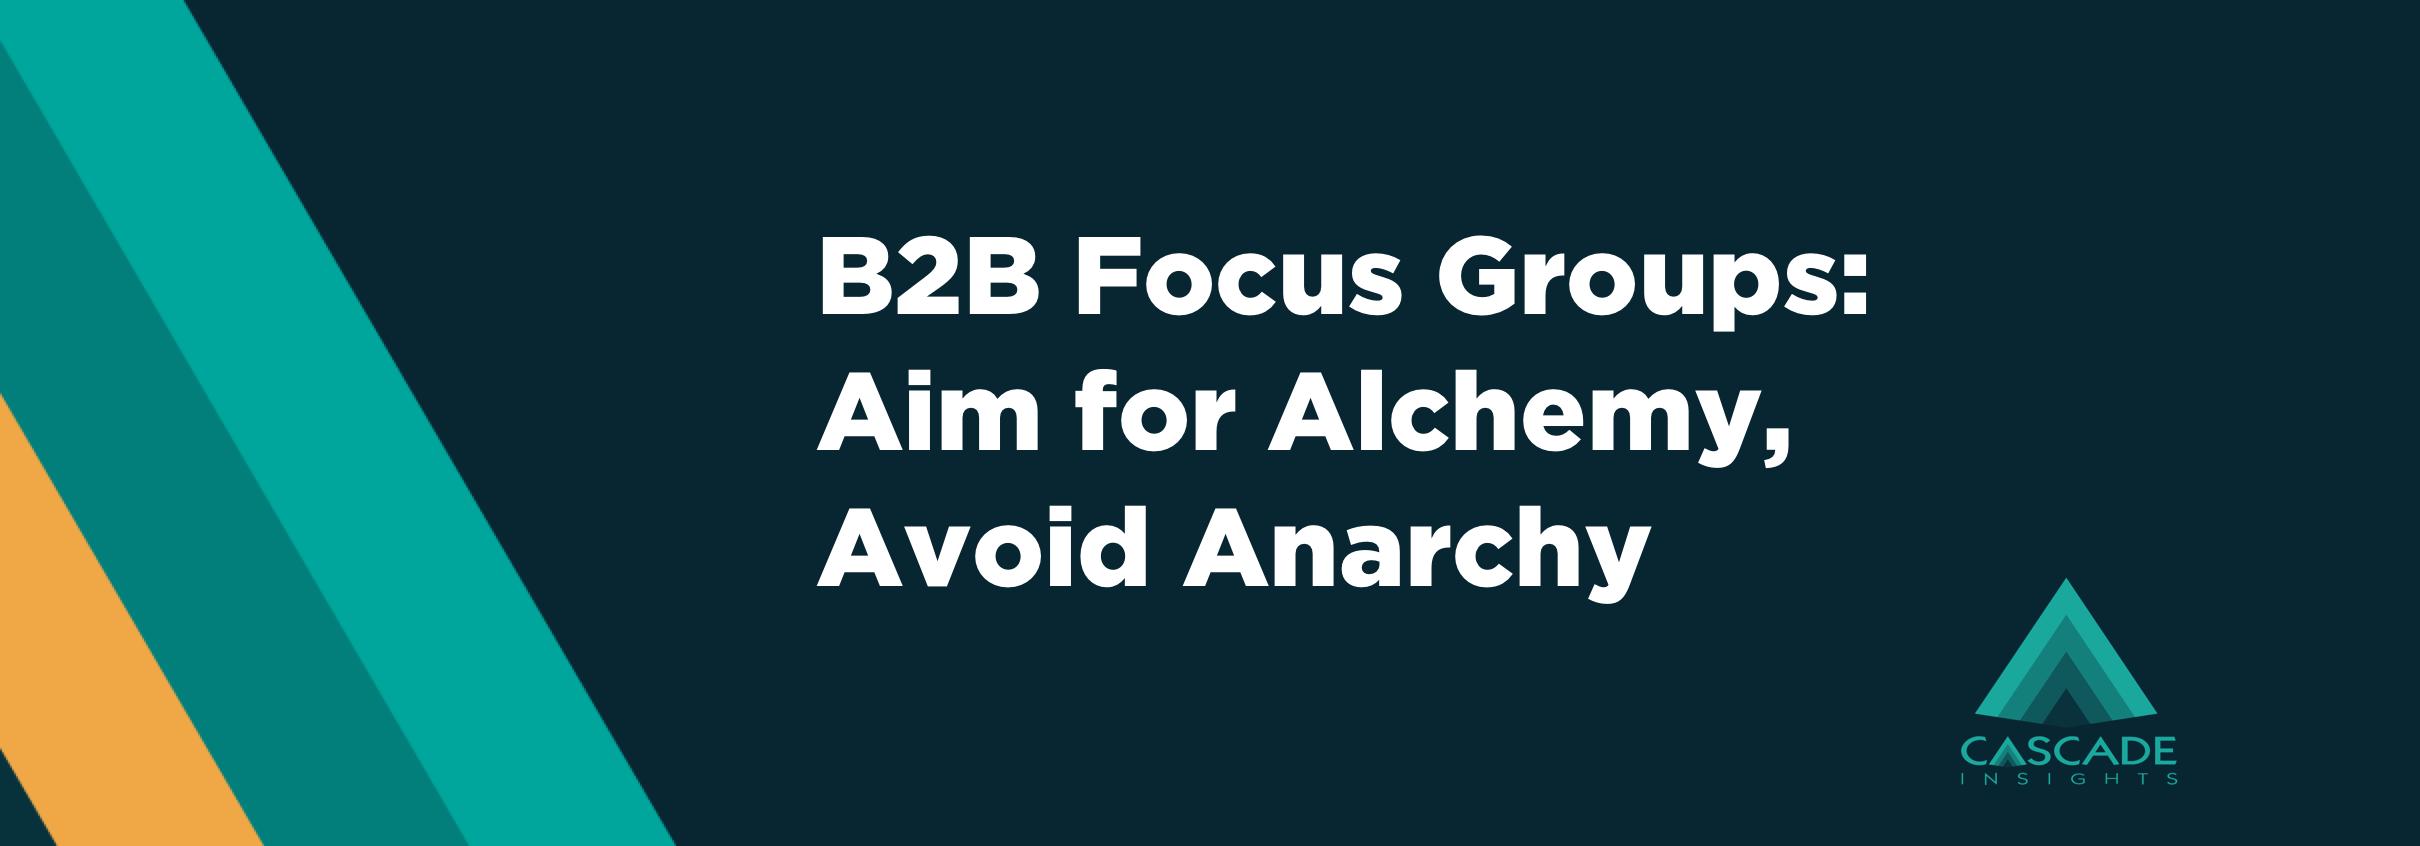 B2B Focus Groups: Aim for Alchemy, Avoid Anarchy